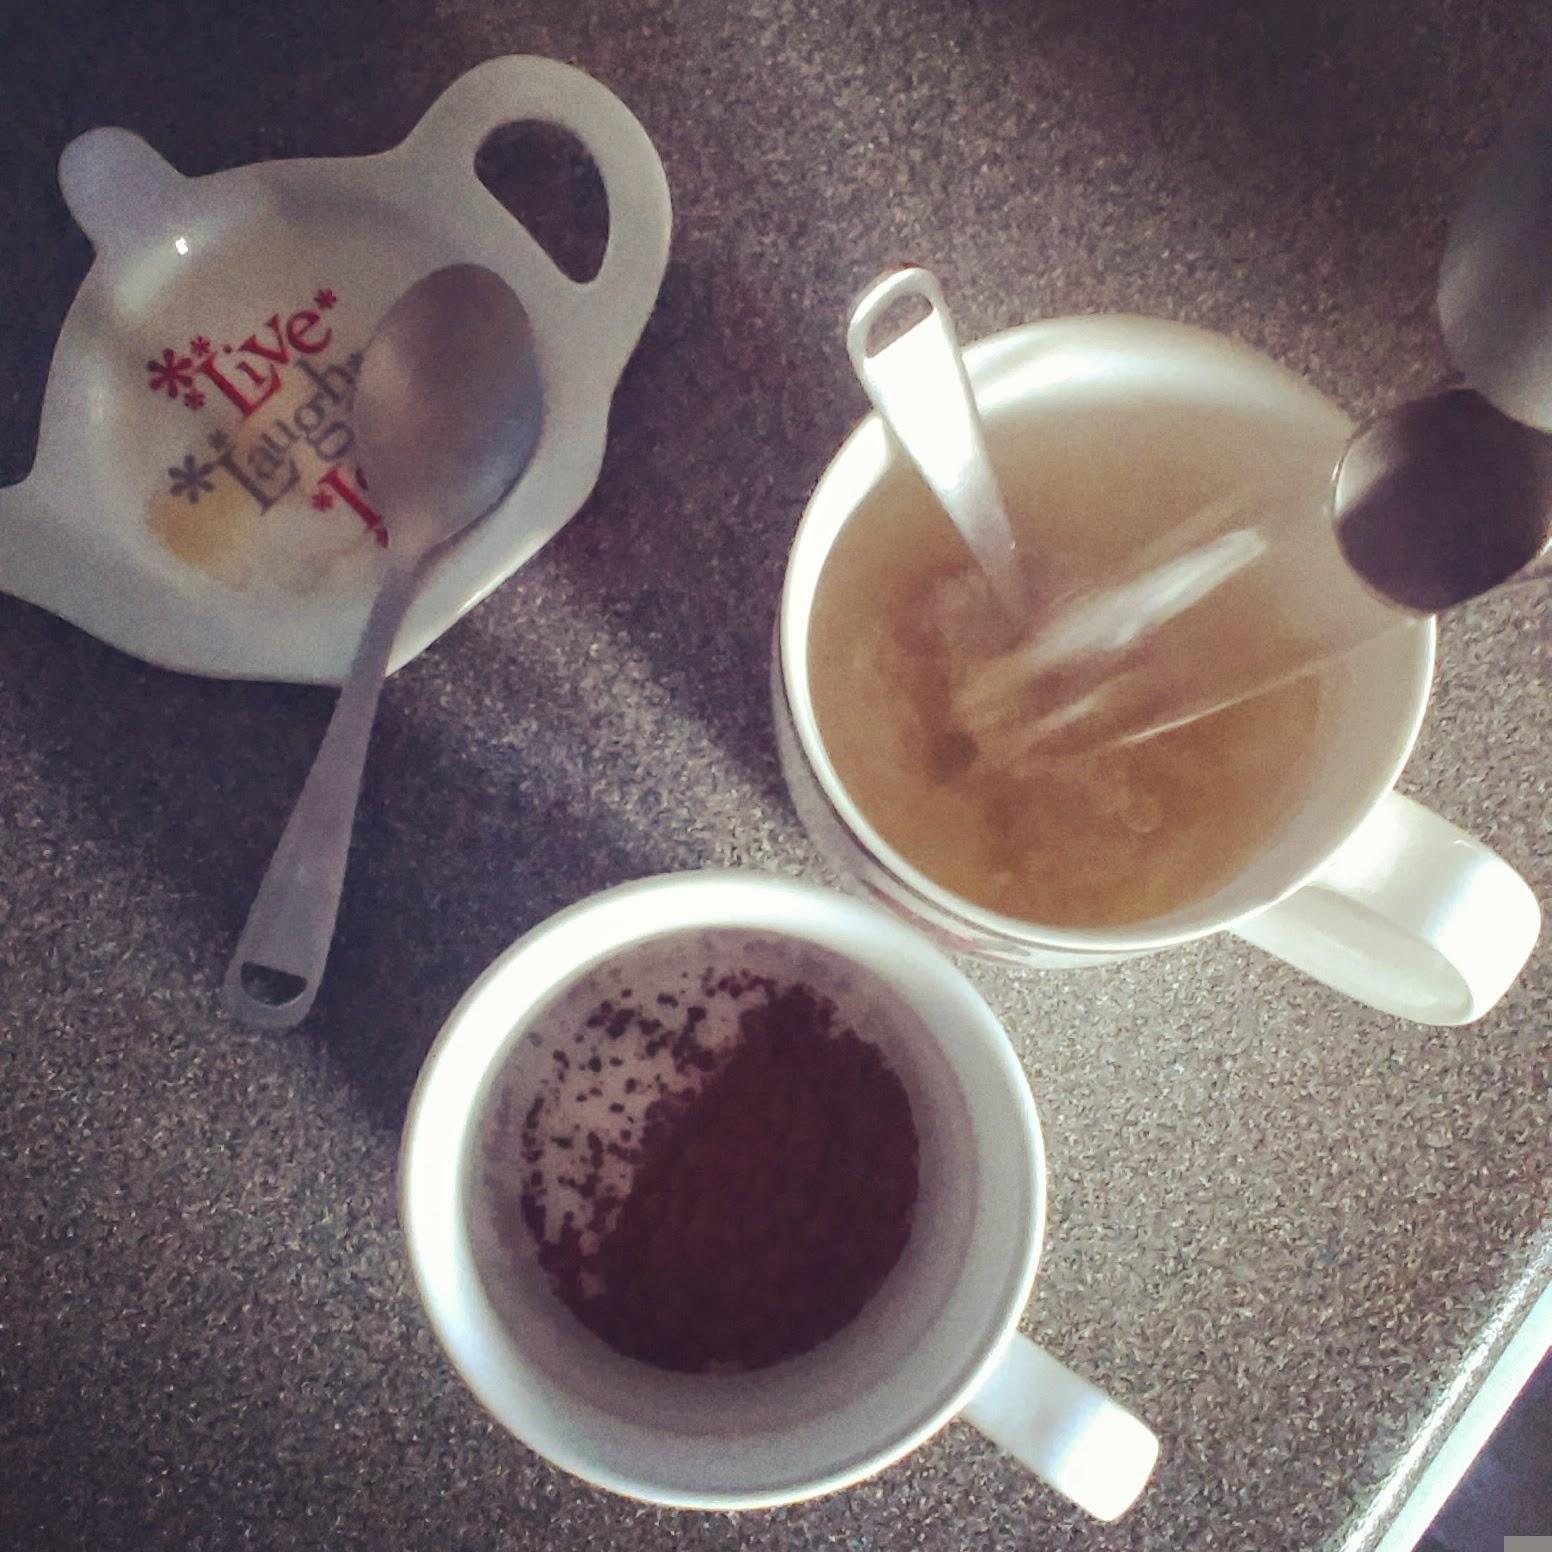 5pm - making tea